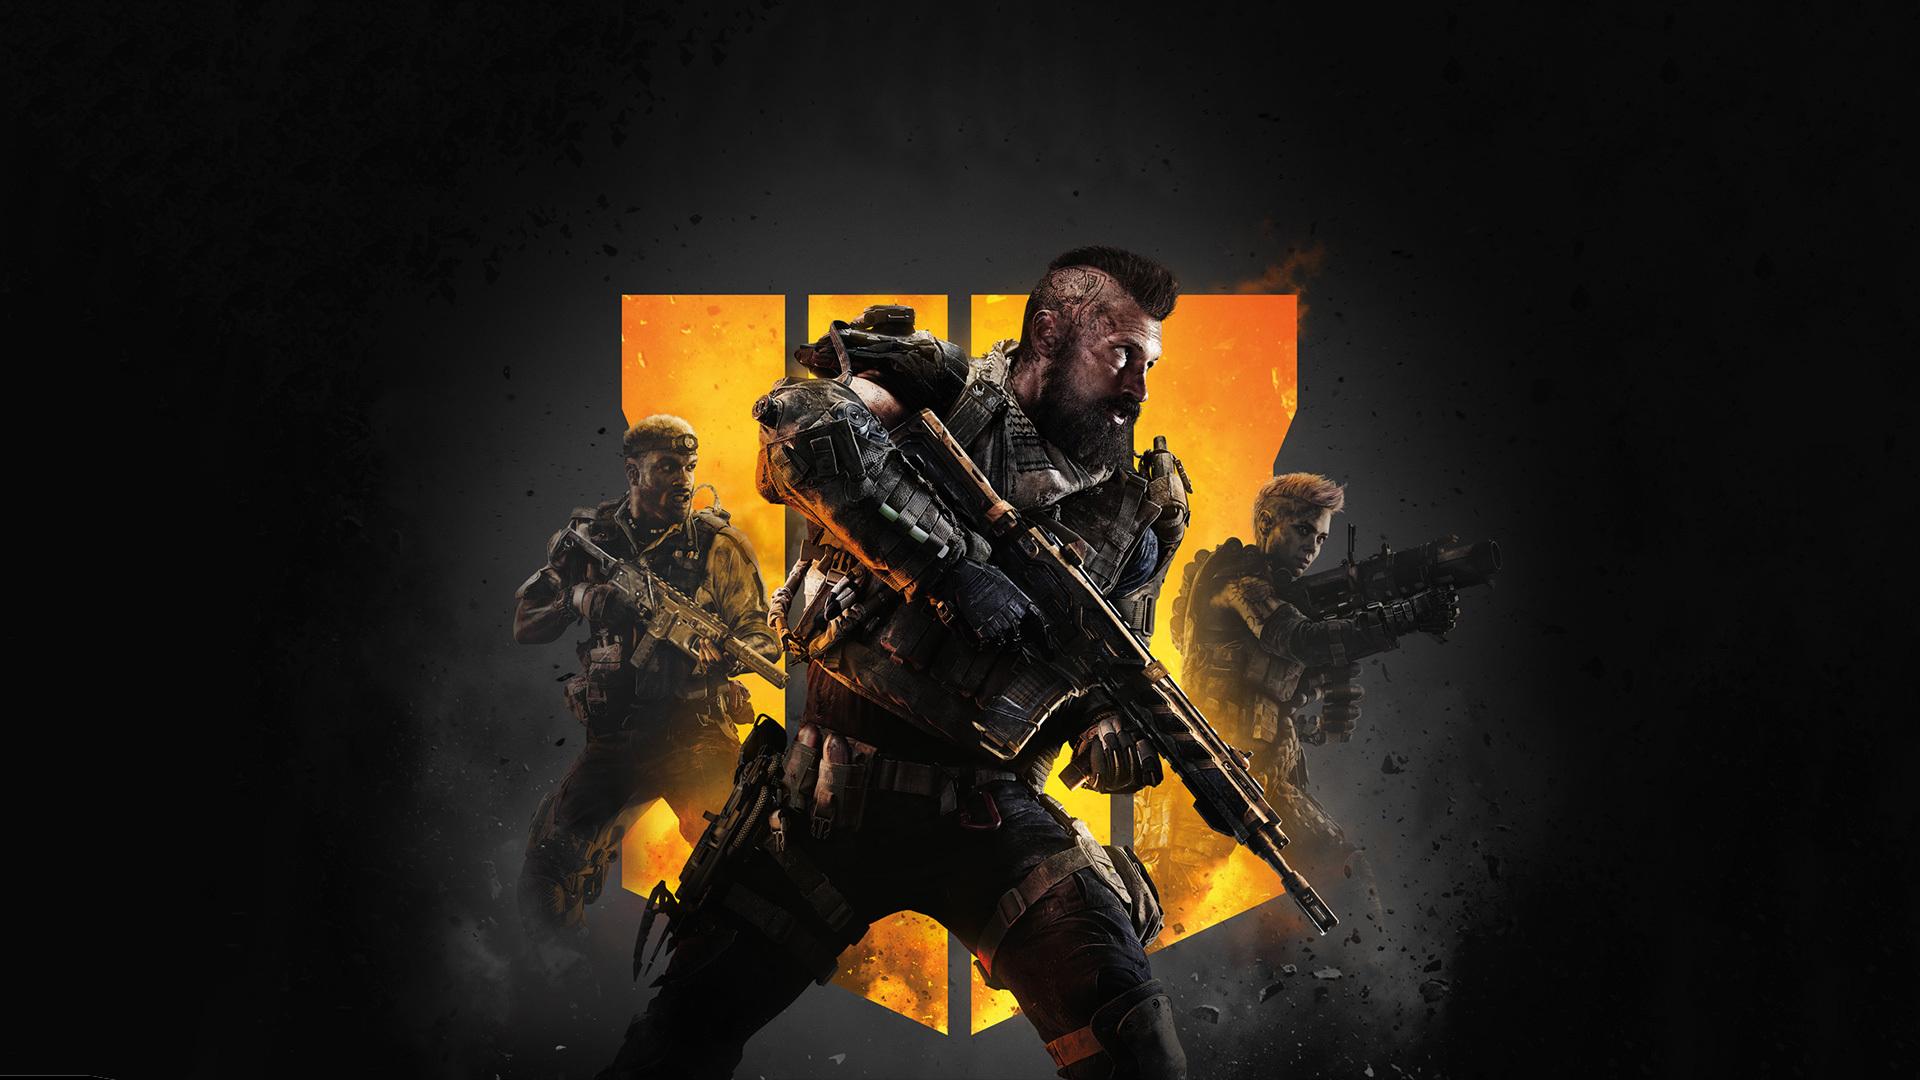 Call Of Duty Black Ops 2 Wallpaper 1920 X 1080: 1920x1080 Call Of Duty Black Ops 4 2018 Laptop Full HD